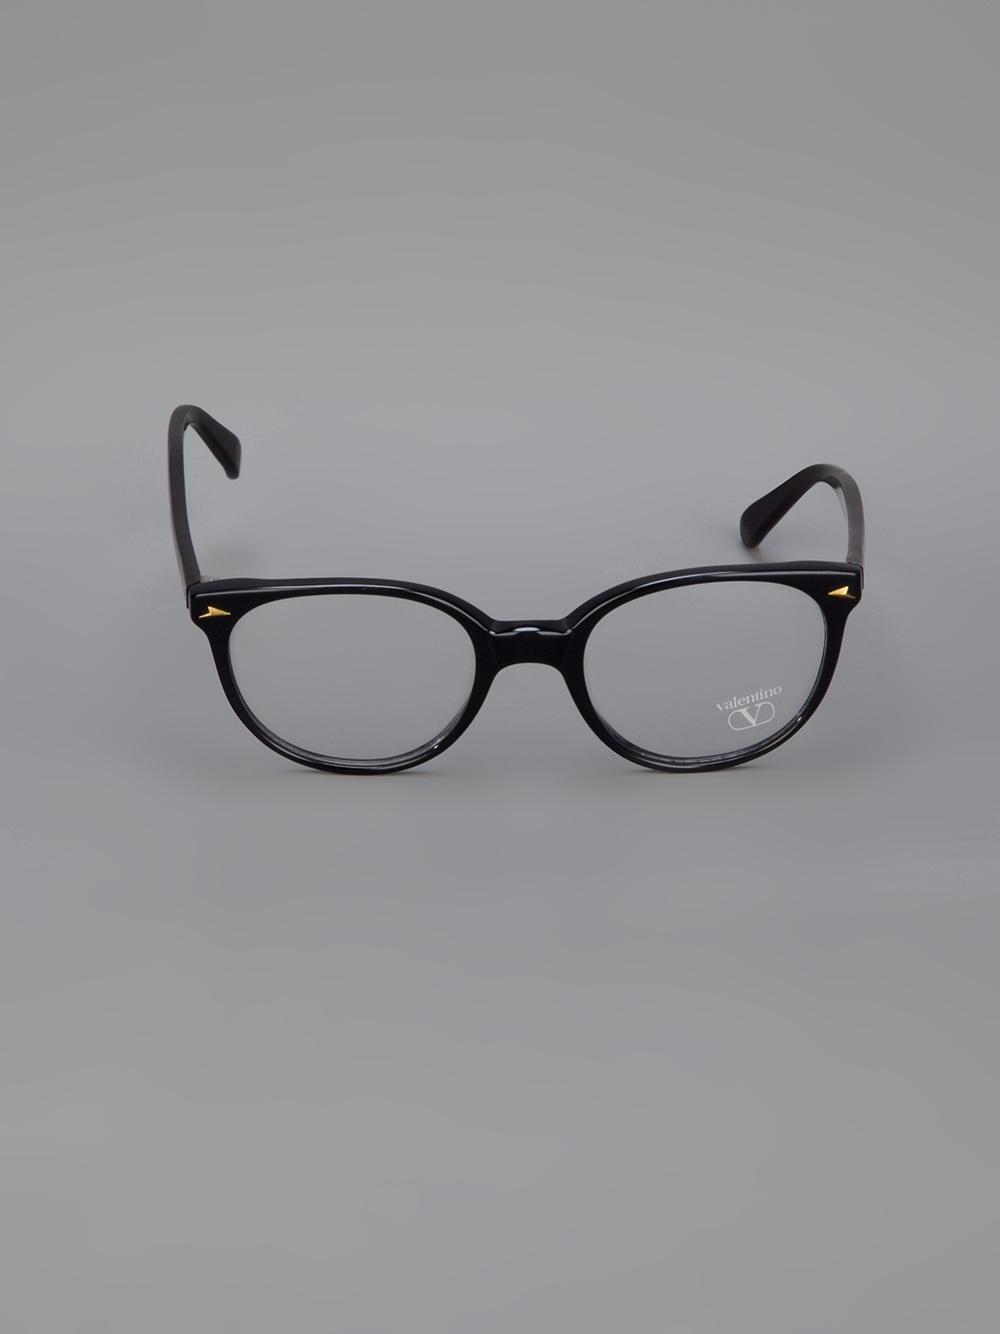 Round Glasses Frame Black : Valentino Round Frame Glasses in Black Lyst